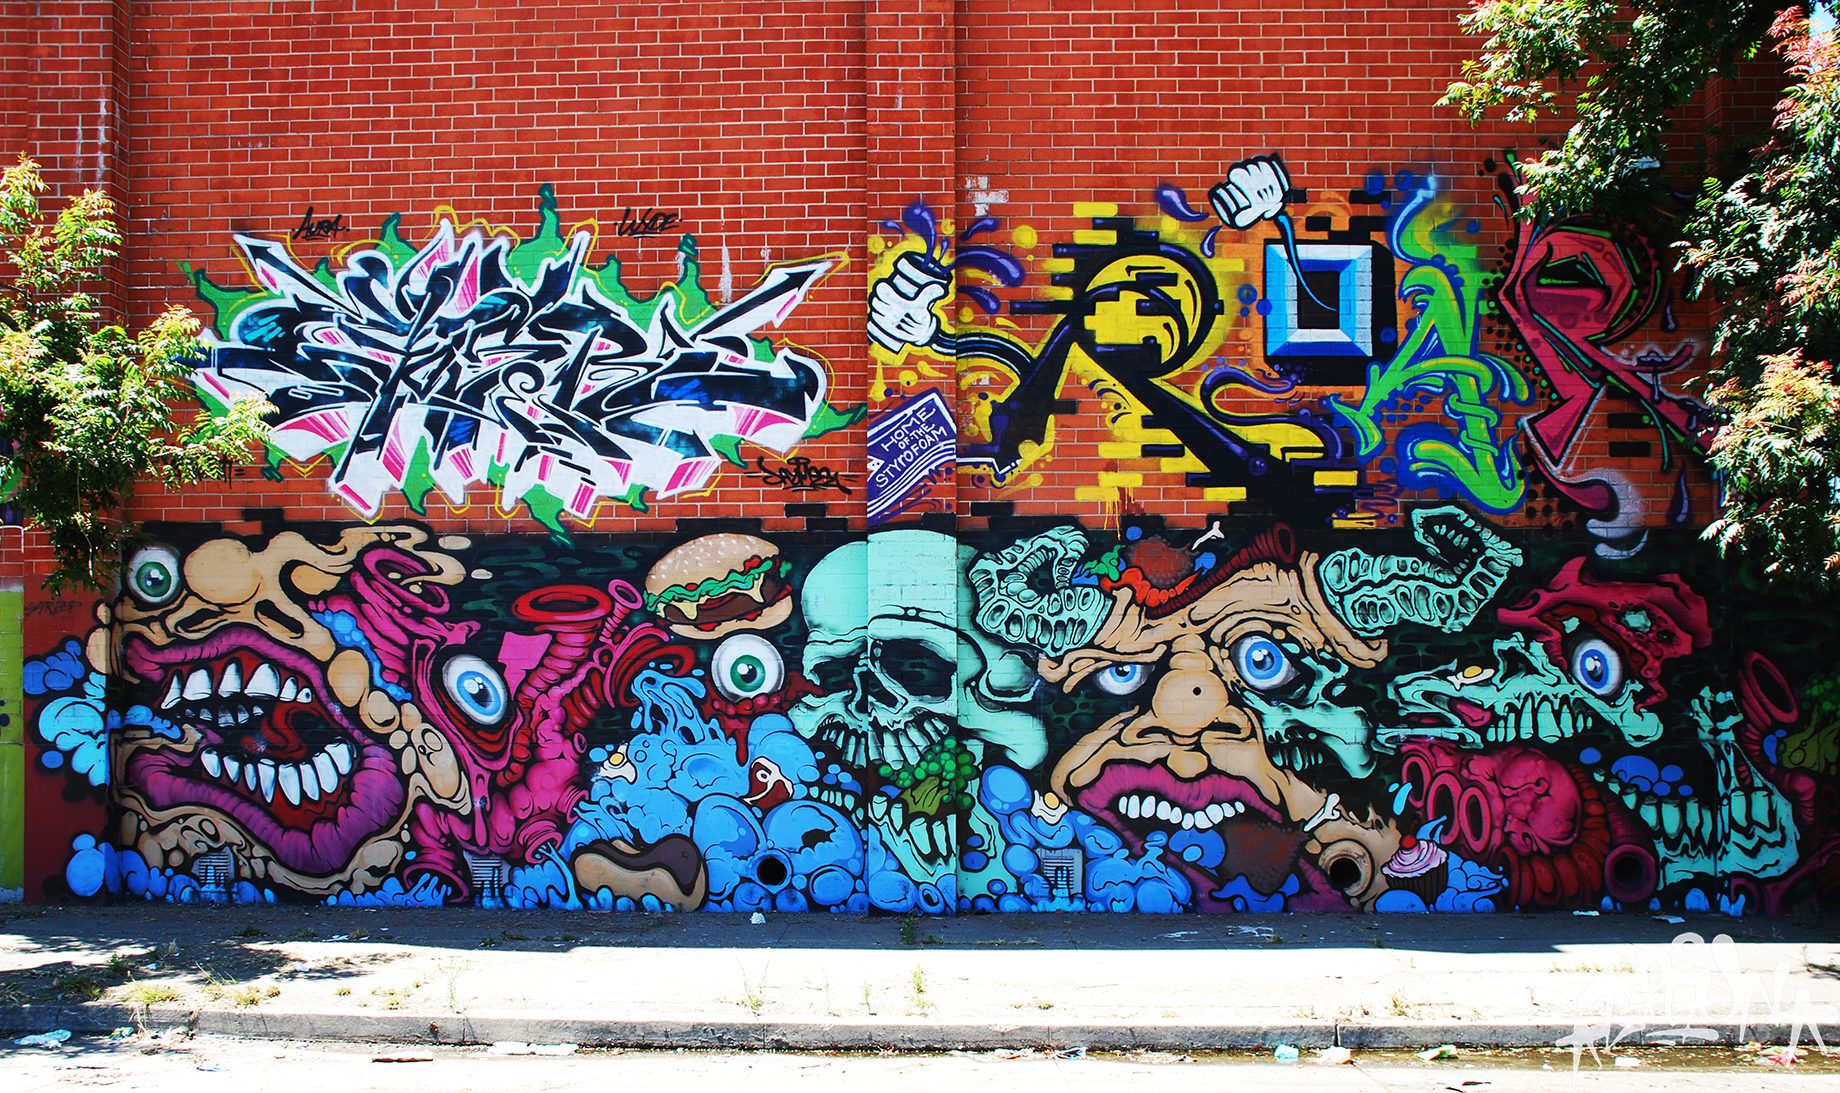 Drawn brick graffito brick wall Com/search?q=brick wall google  google